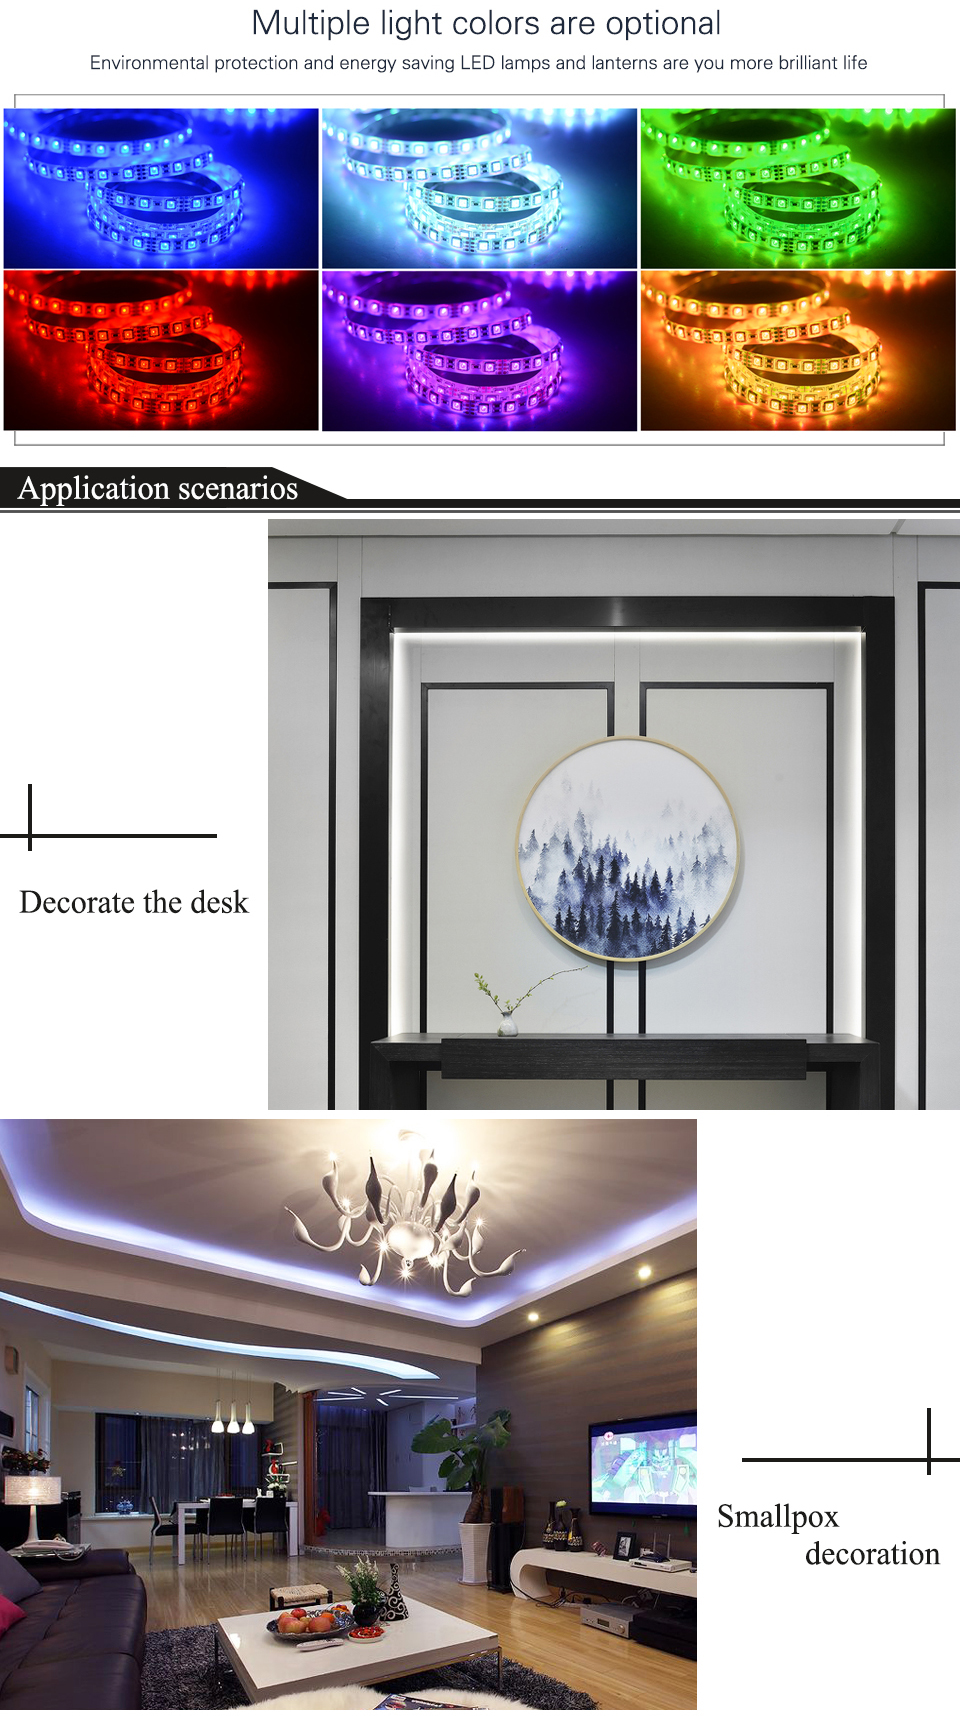 HTB1EkyVbgoSMeJjSspaq6zMOFXau EnwYe 5M 300Leds waterproof RGB Led Strip Light 3528 5050 DC12V 60Leds/M Fiexble Light Led Ribbon Tape Home Decoration Lamp